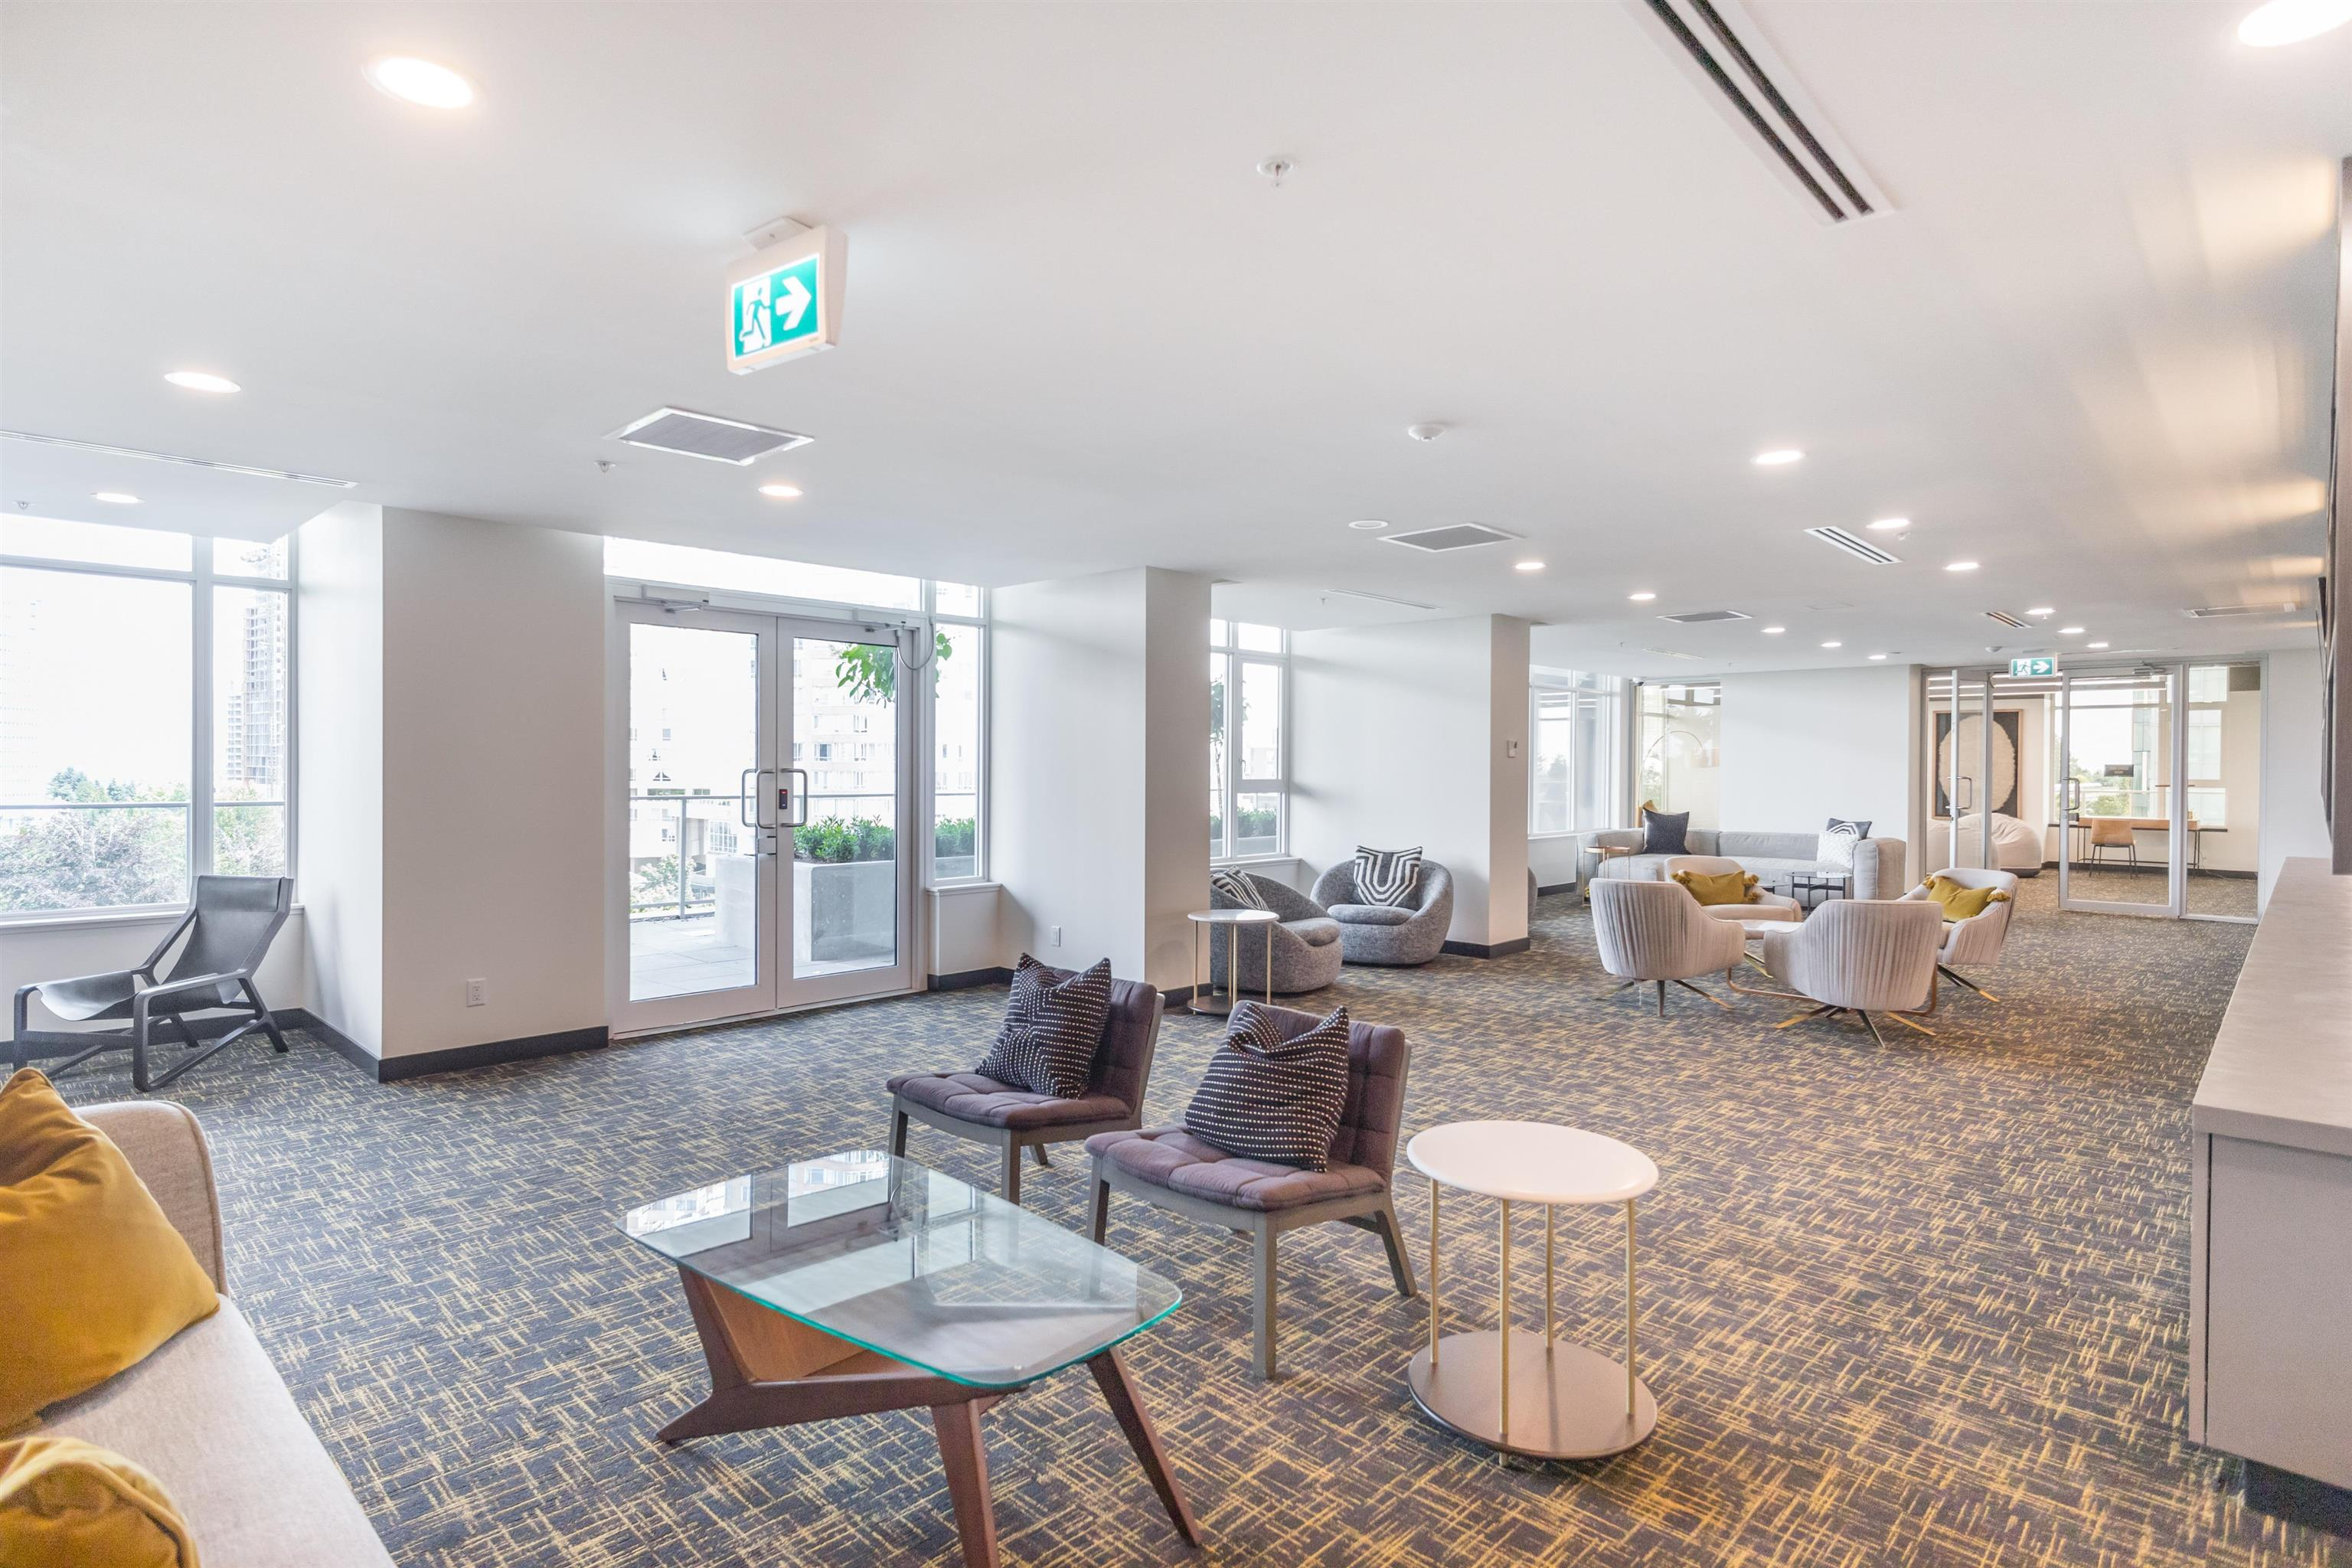 2206 6383 MCKAY AVENUE - Metrotown Apartment/Condo for sale, 2 Bedrooms (R2625647) - #34